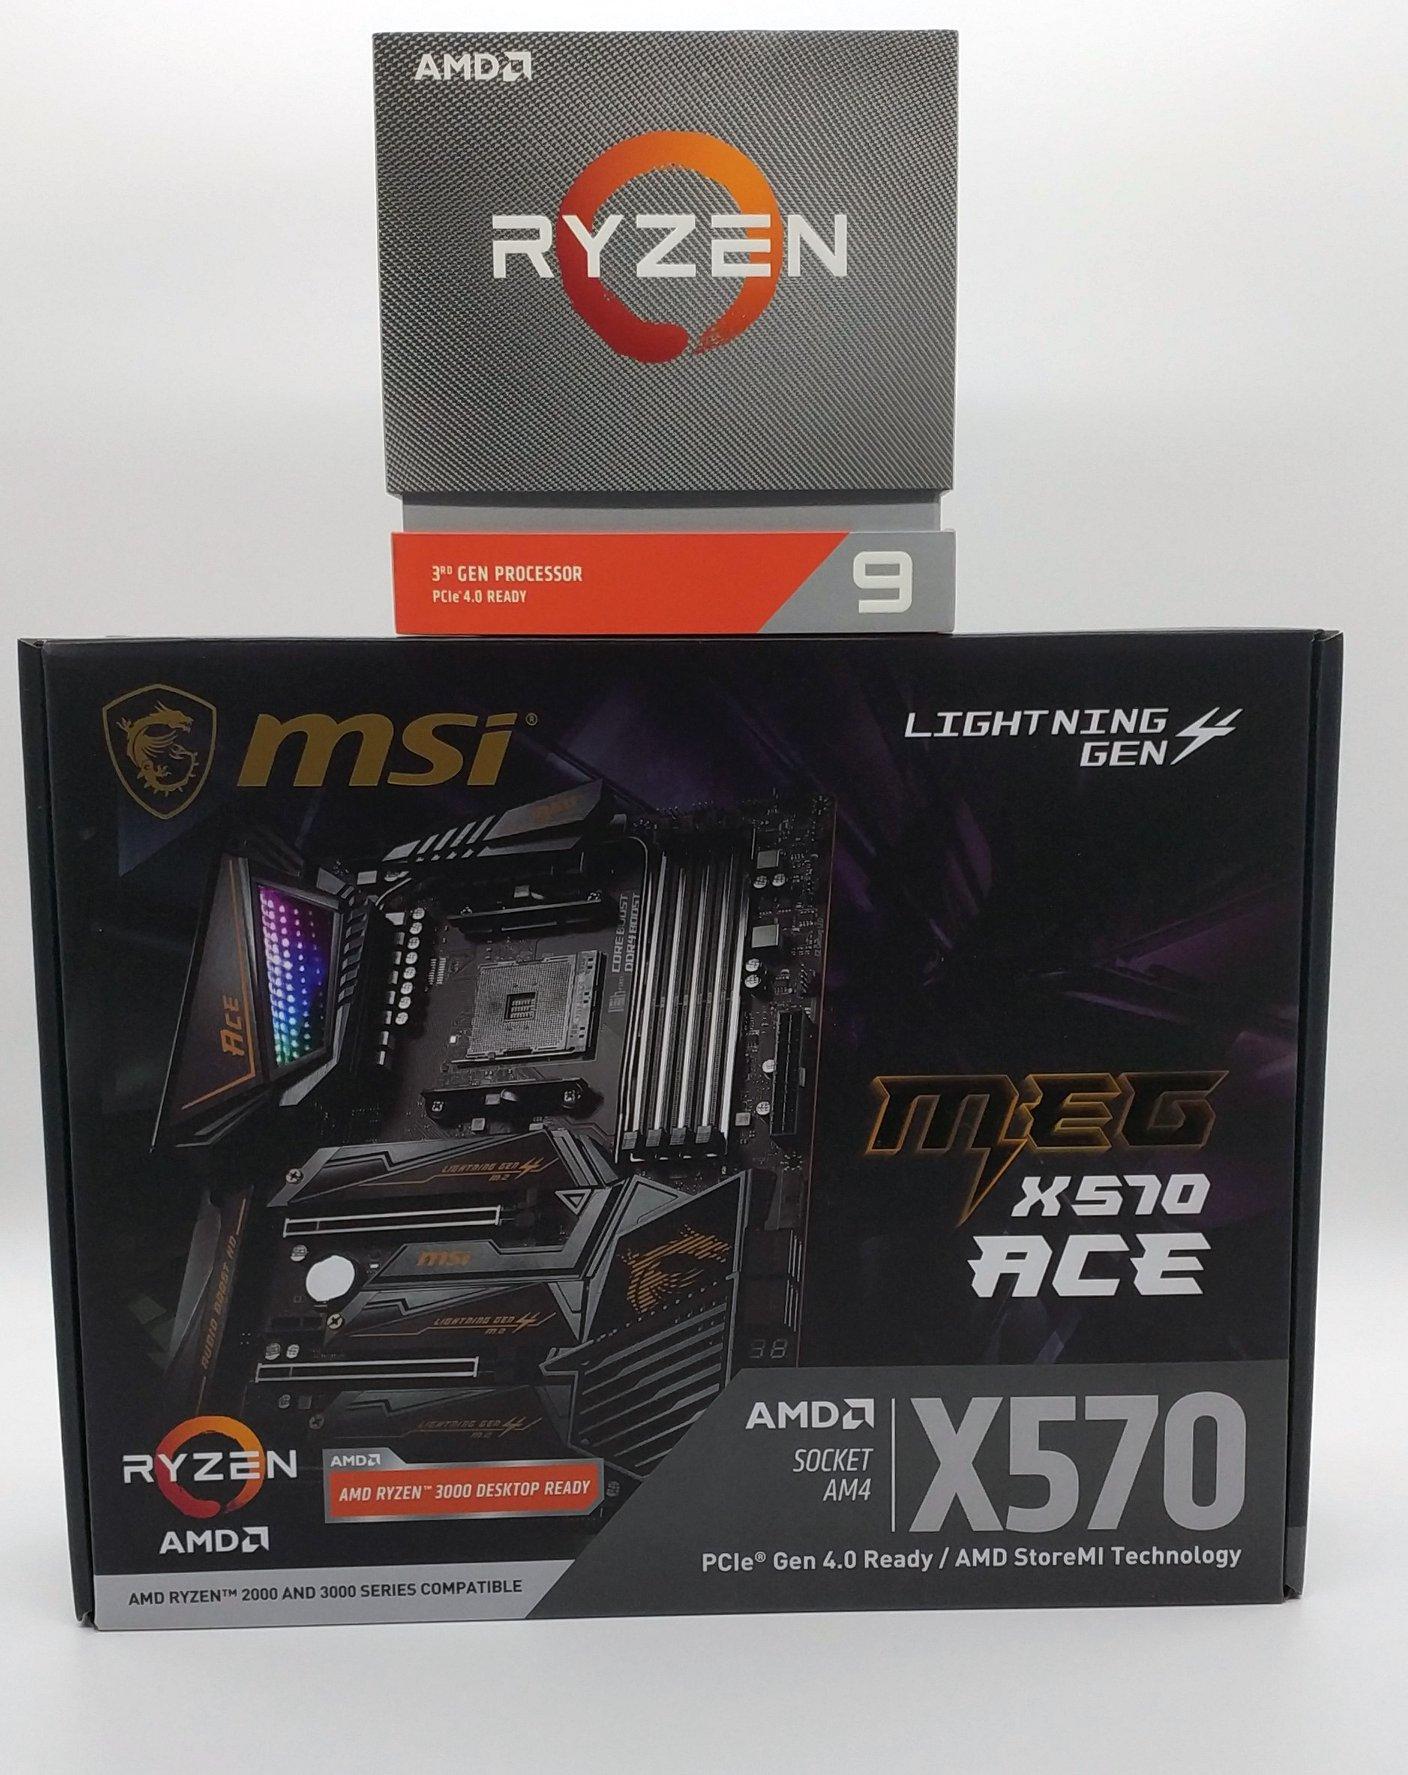 MSI MEG X570 ACE Mainboard samt Ryzen 9 3900X